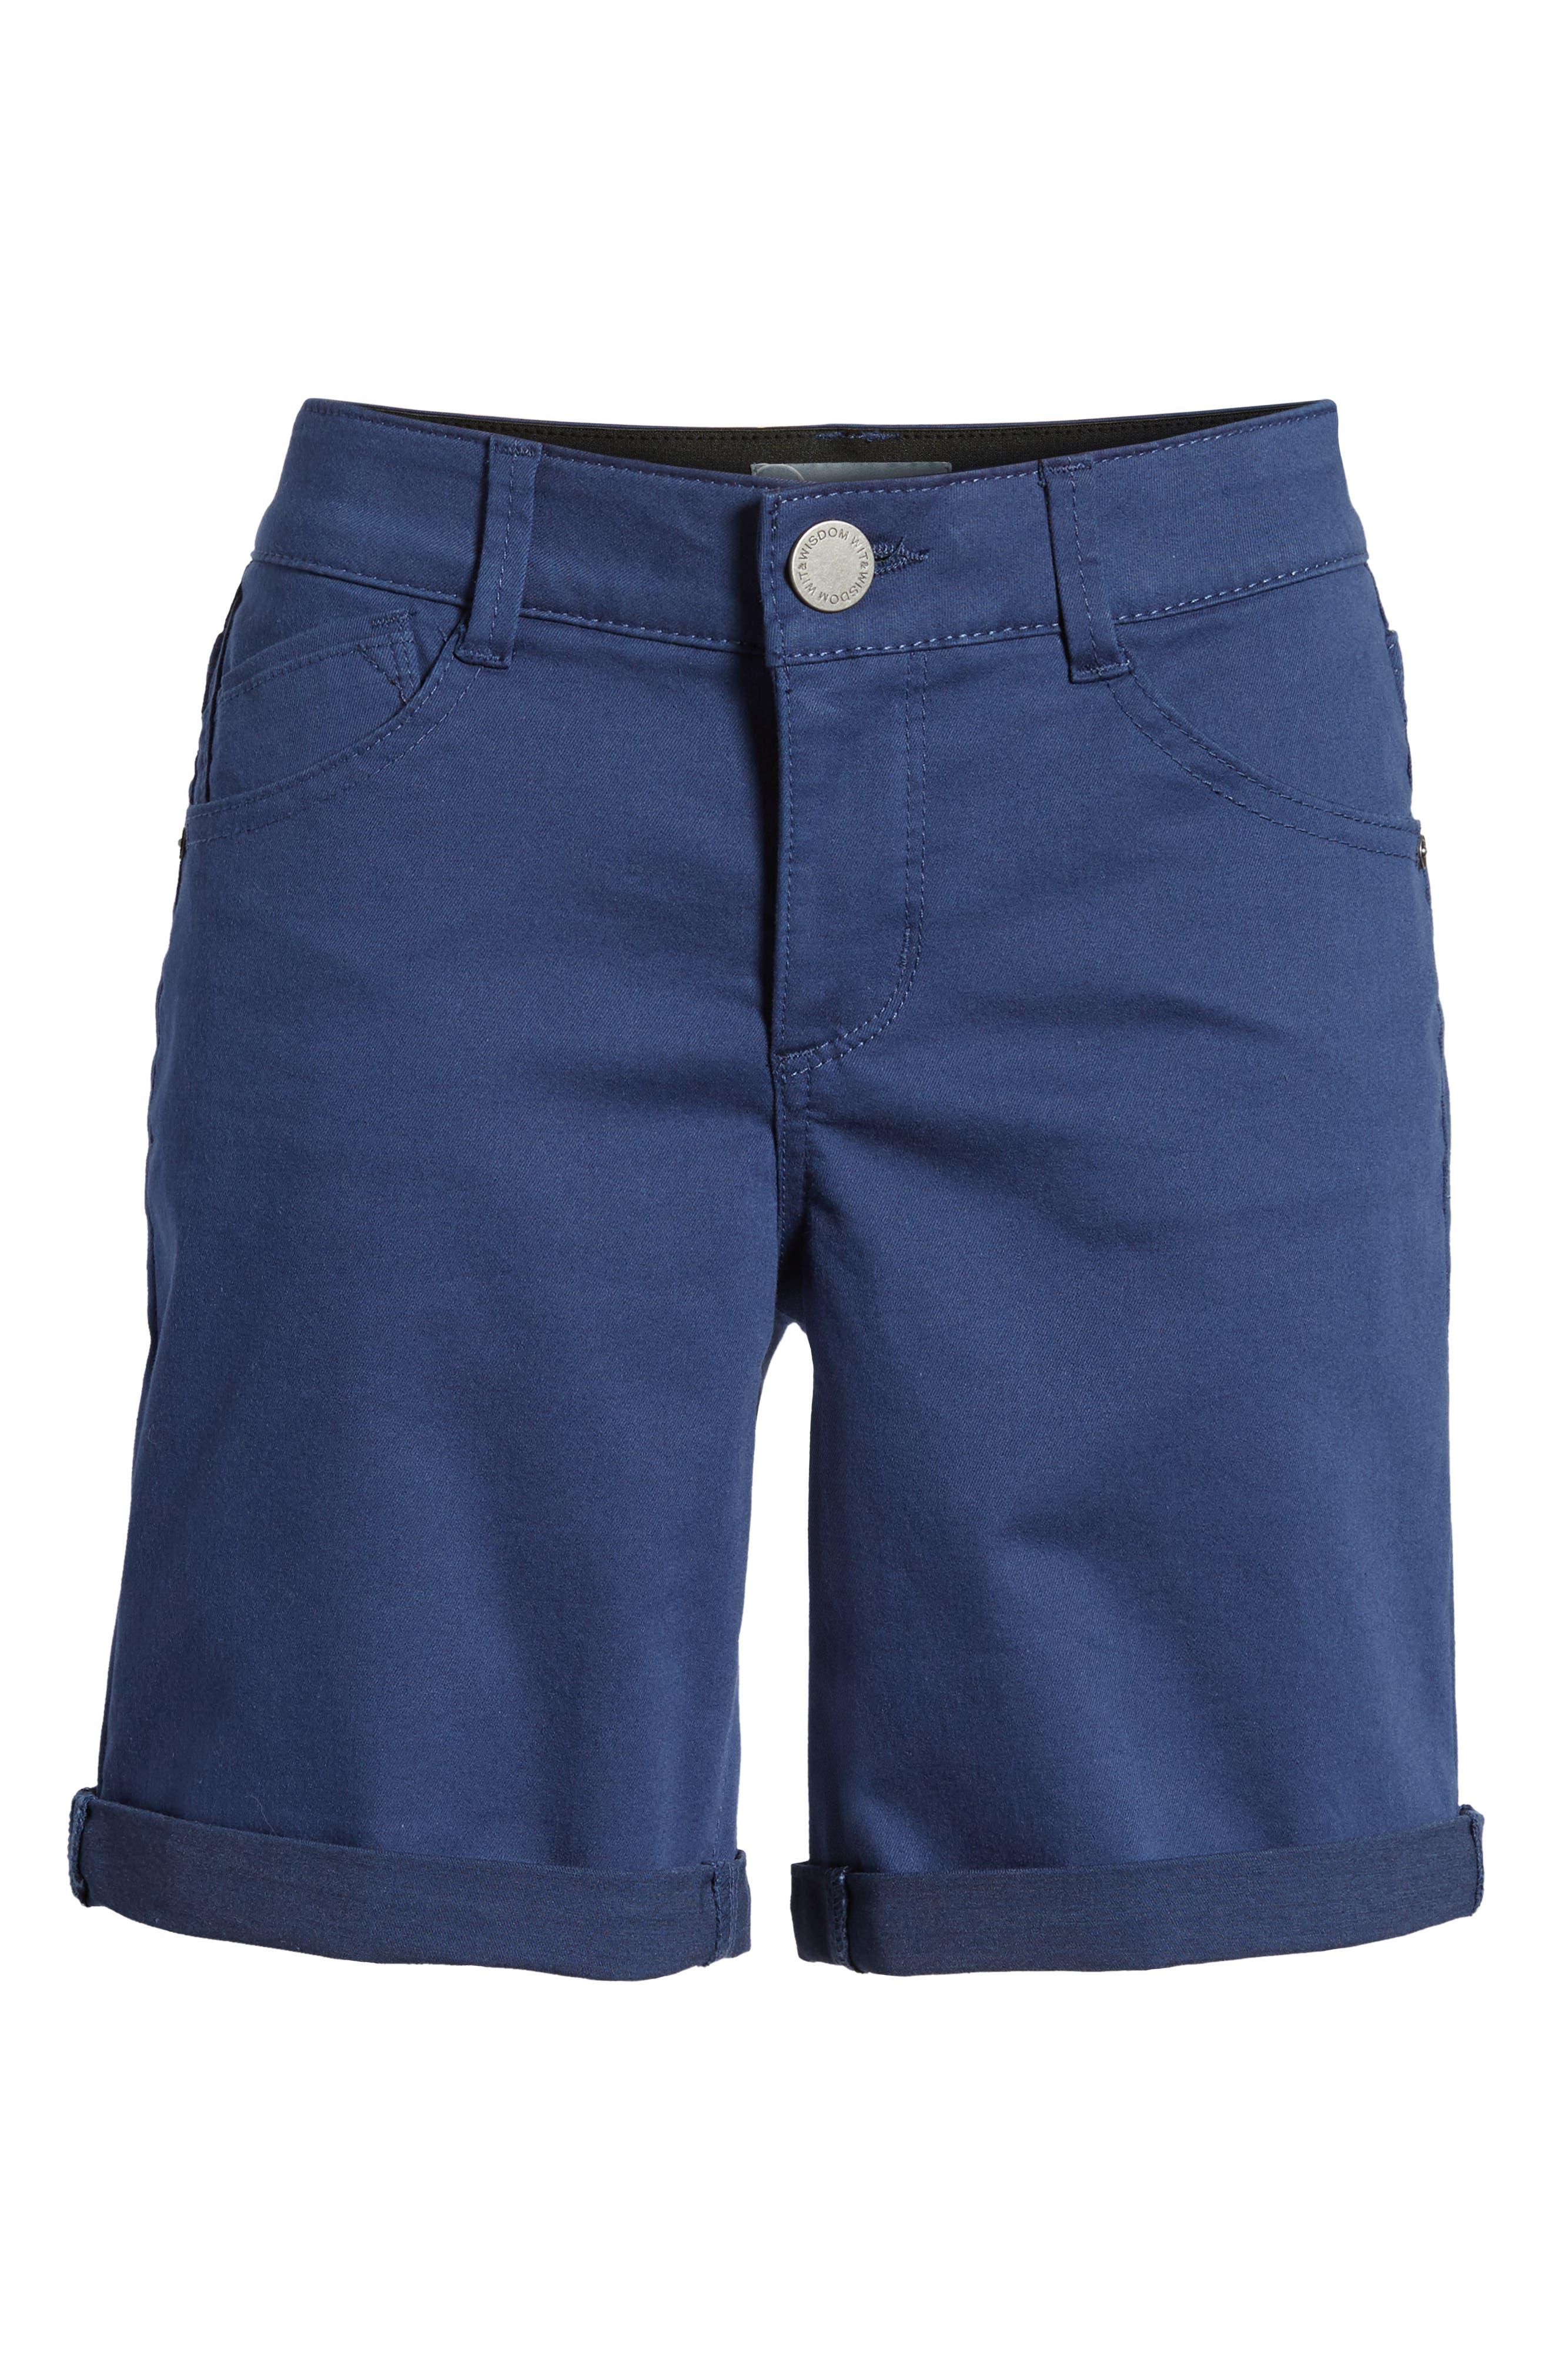 Ab-Solution Stretch Cotton Shorts,                             Alternate thumbnail 6, color,                             Coastal Blue